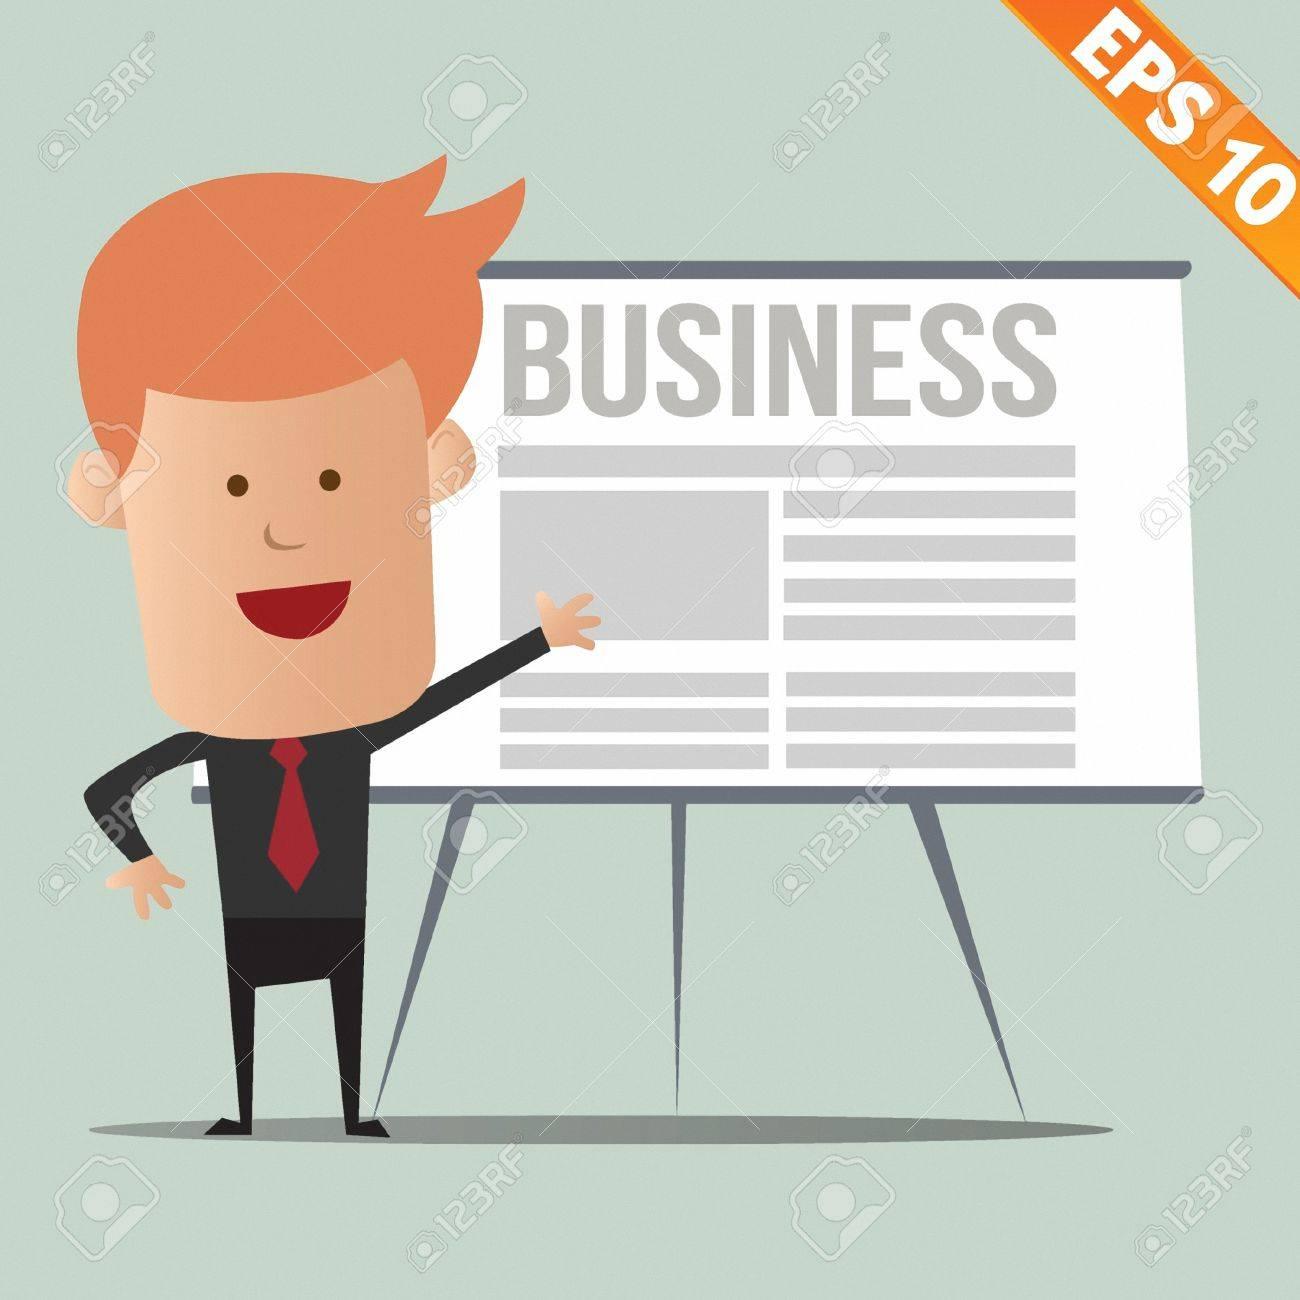 Cartoon business man present information - Vector illustration - EPS10 Stock Vector - 22545057